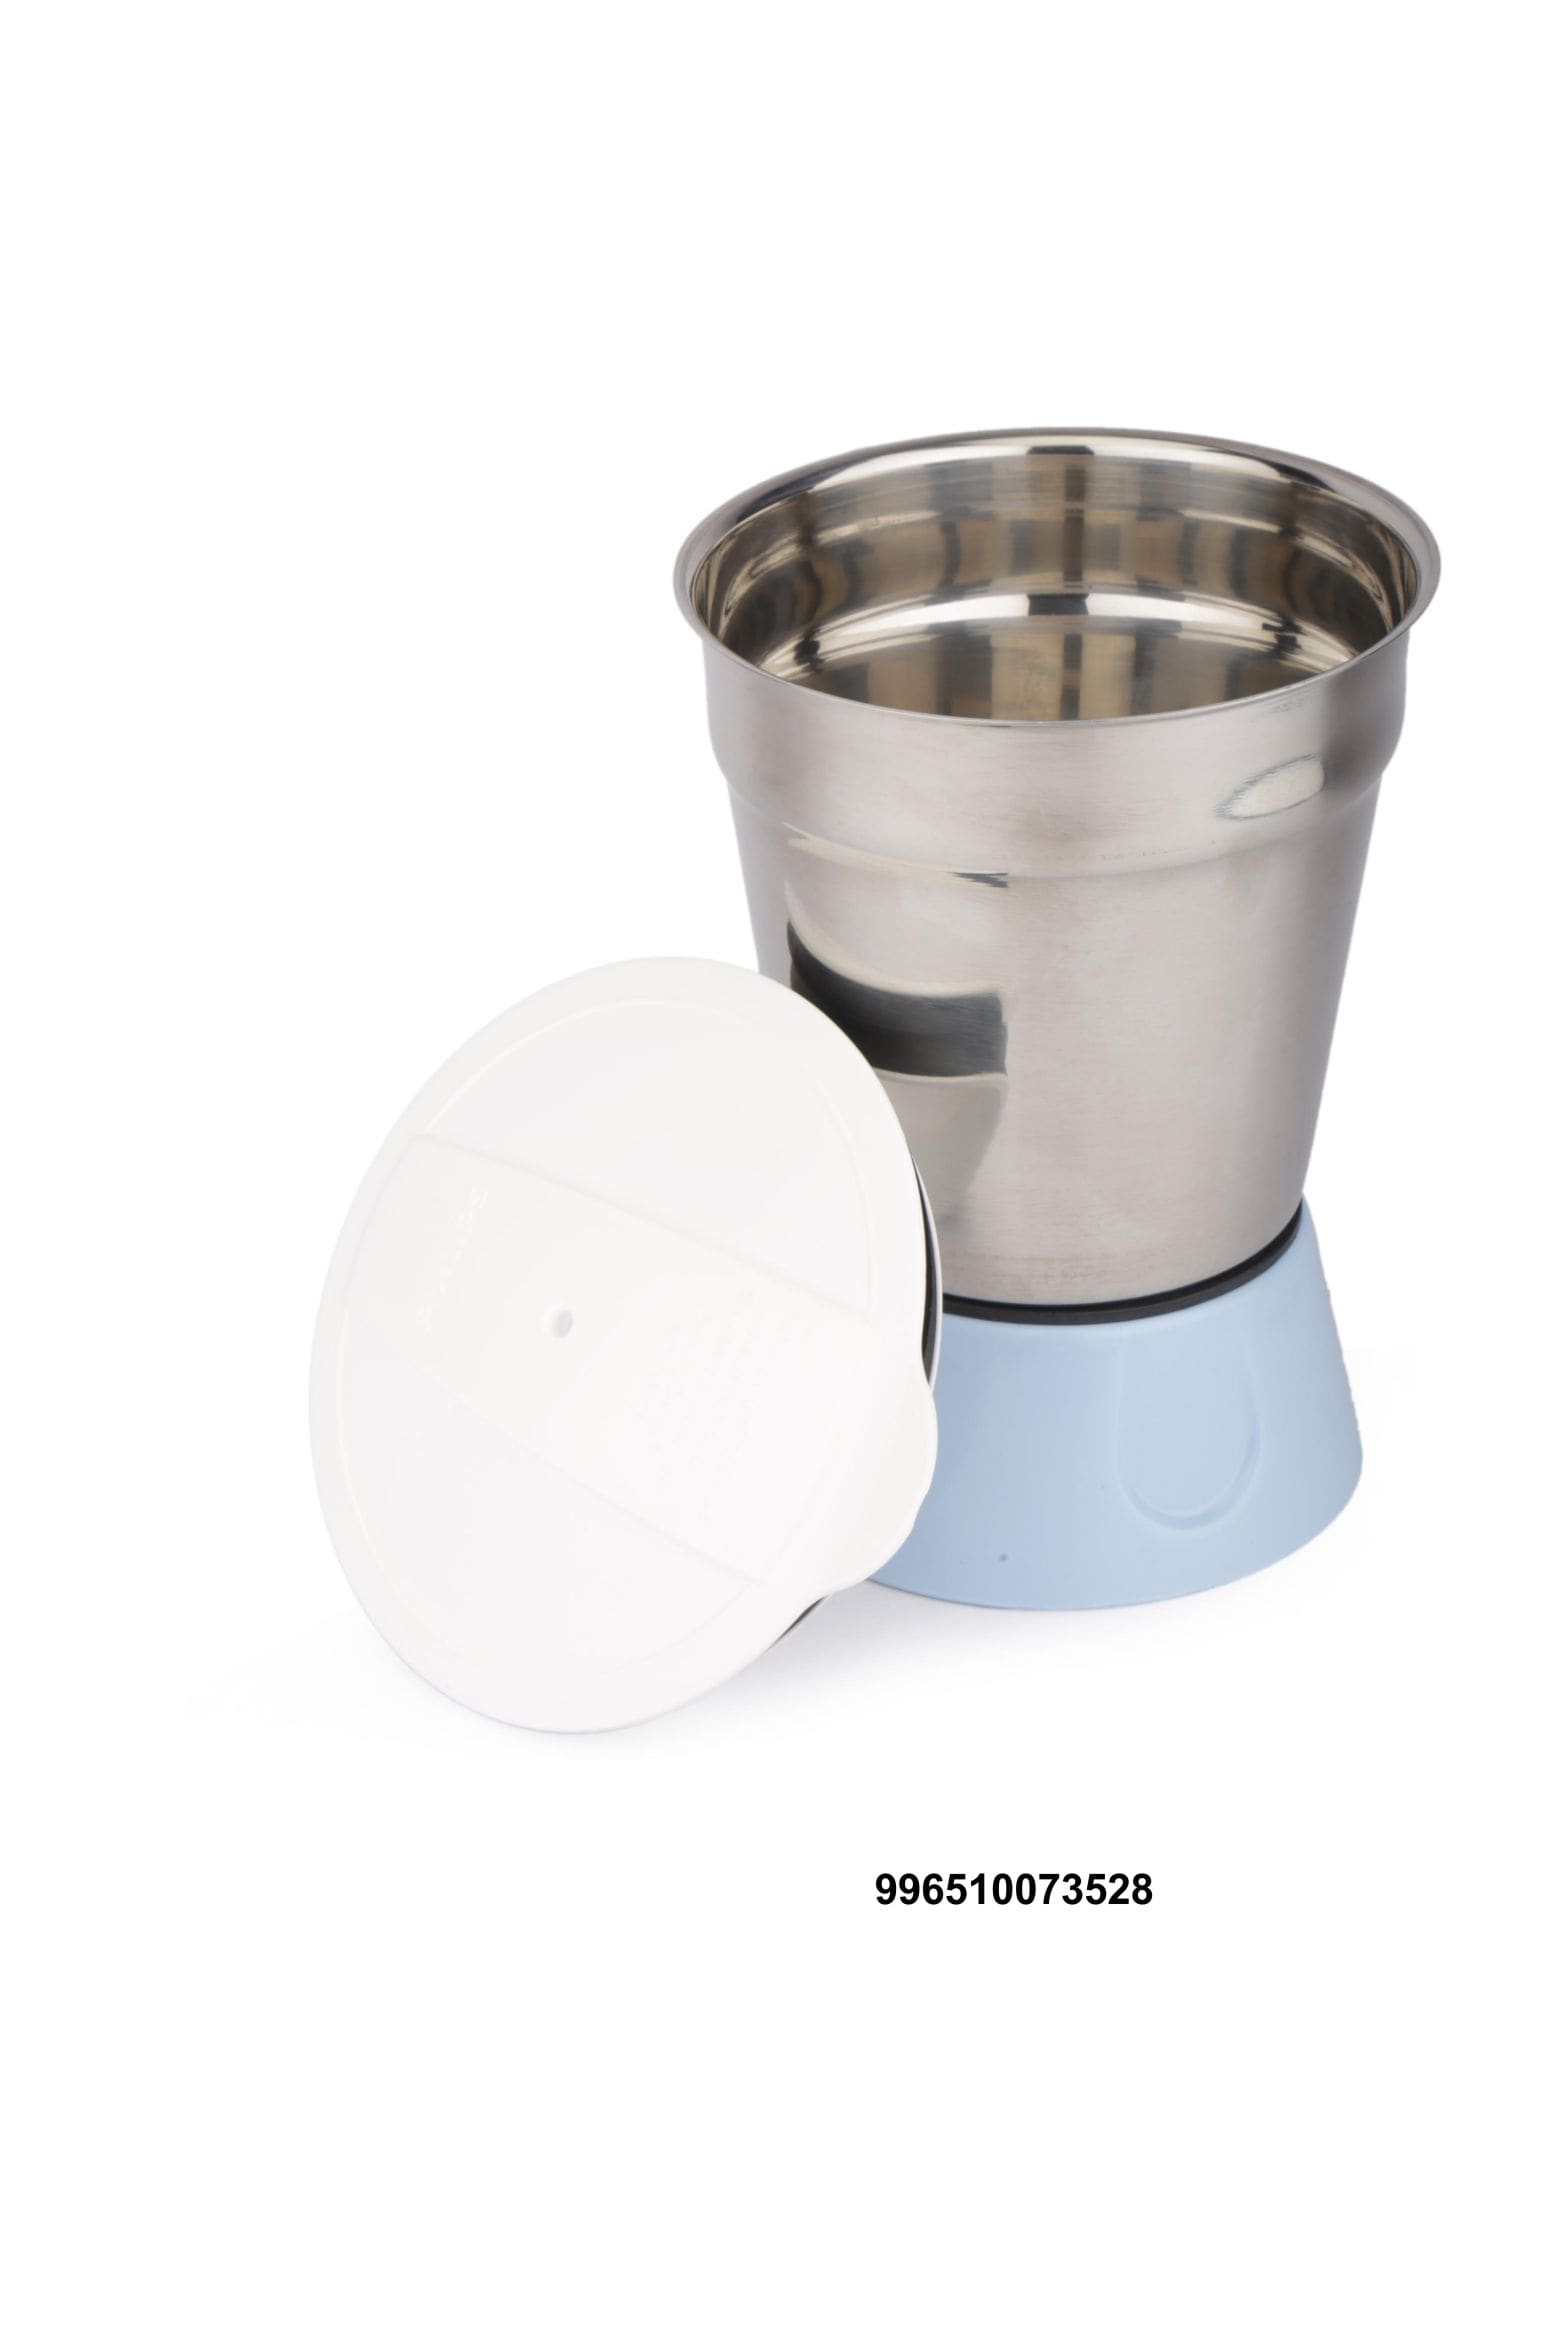 Multipurpose Jar Assembly